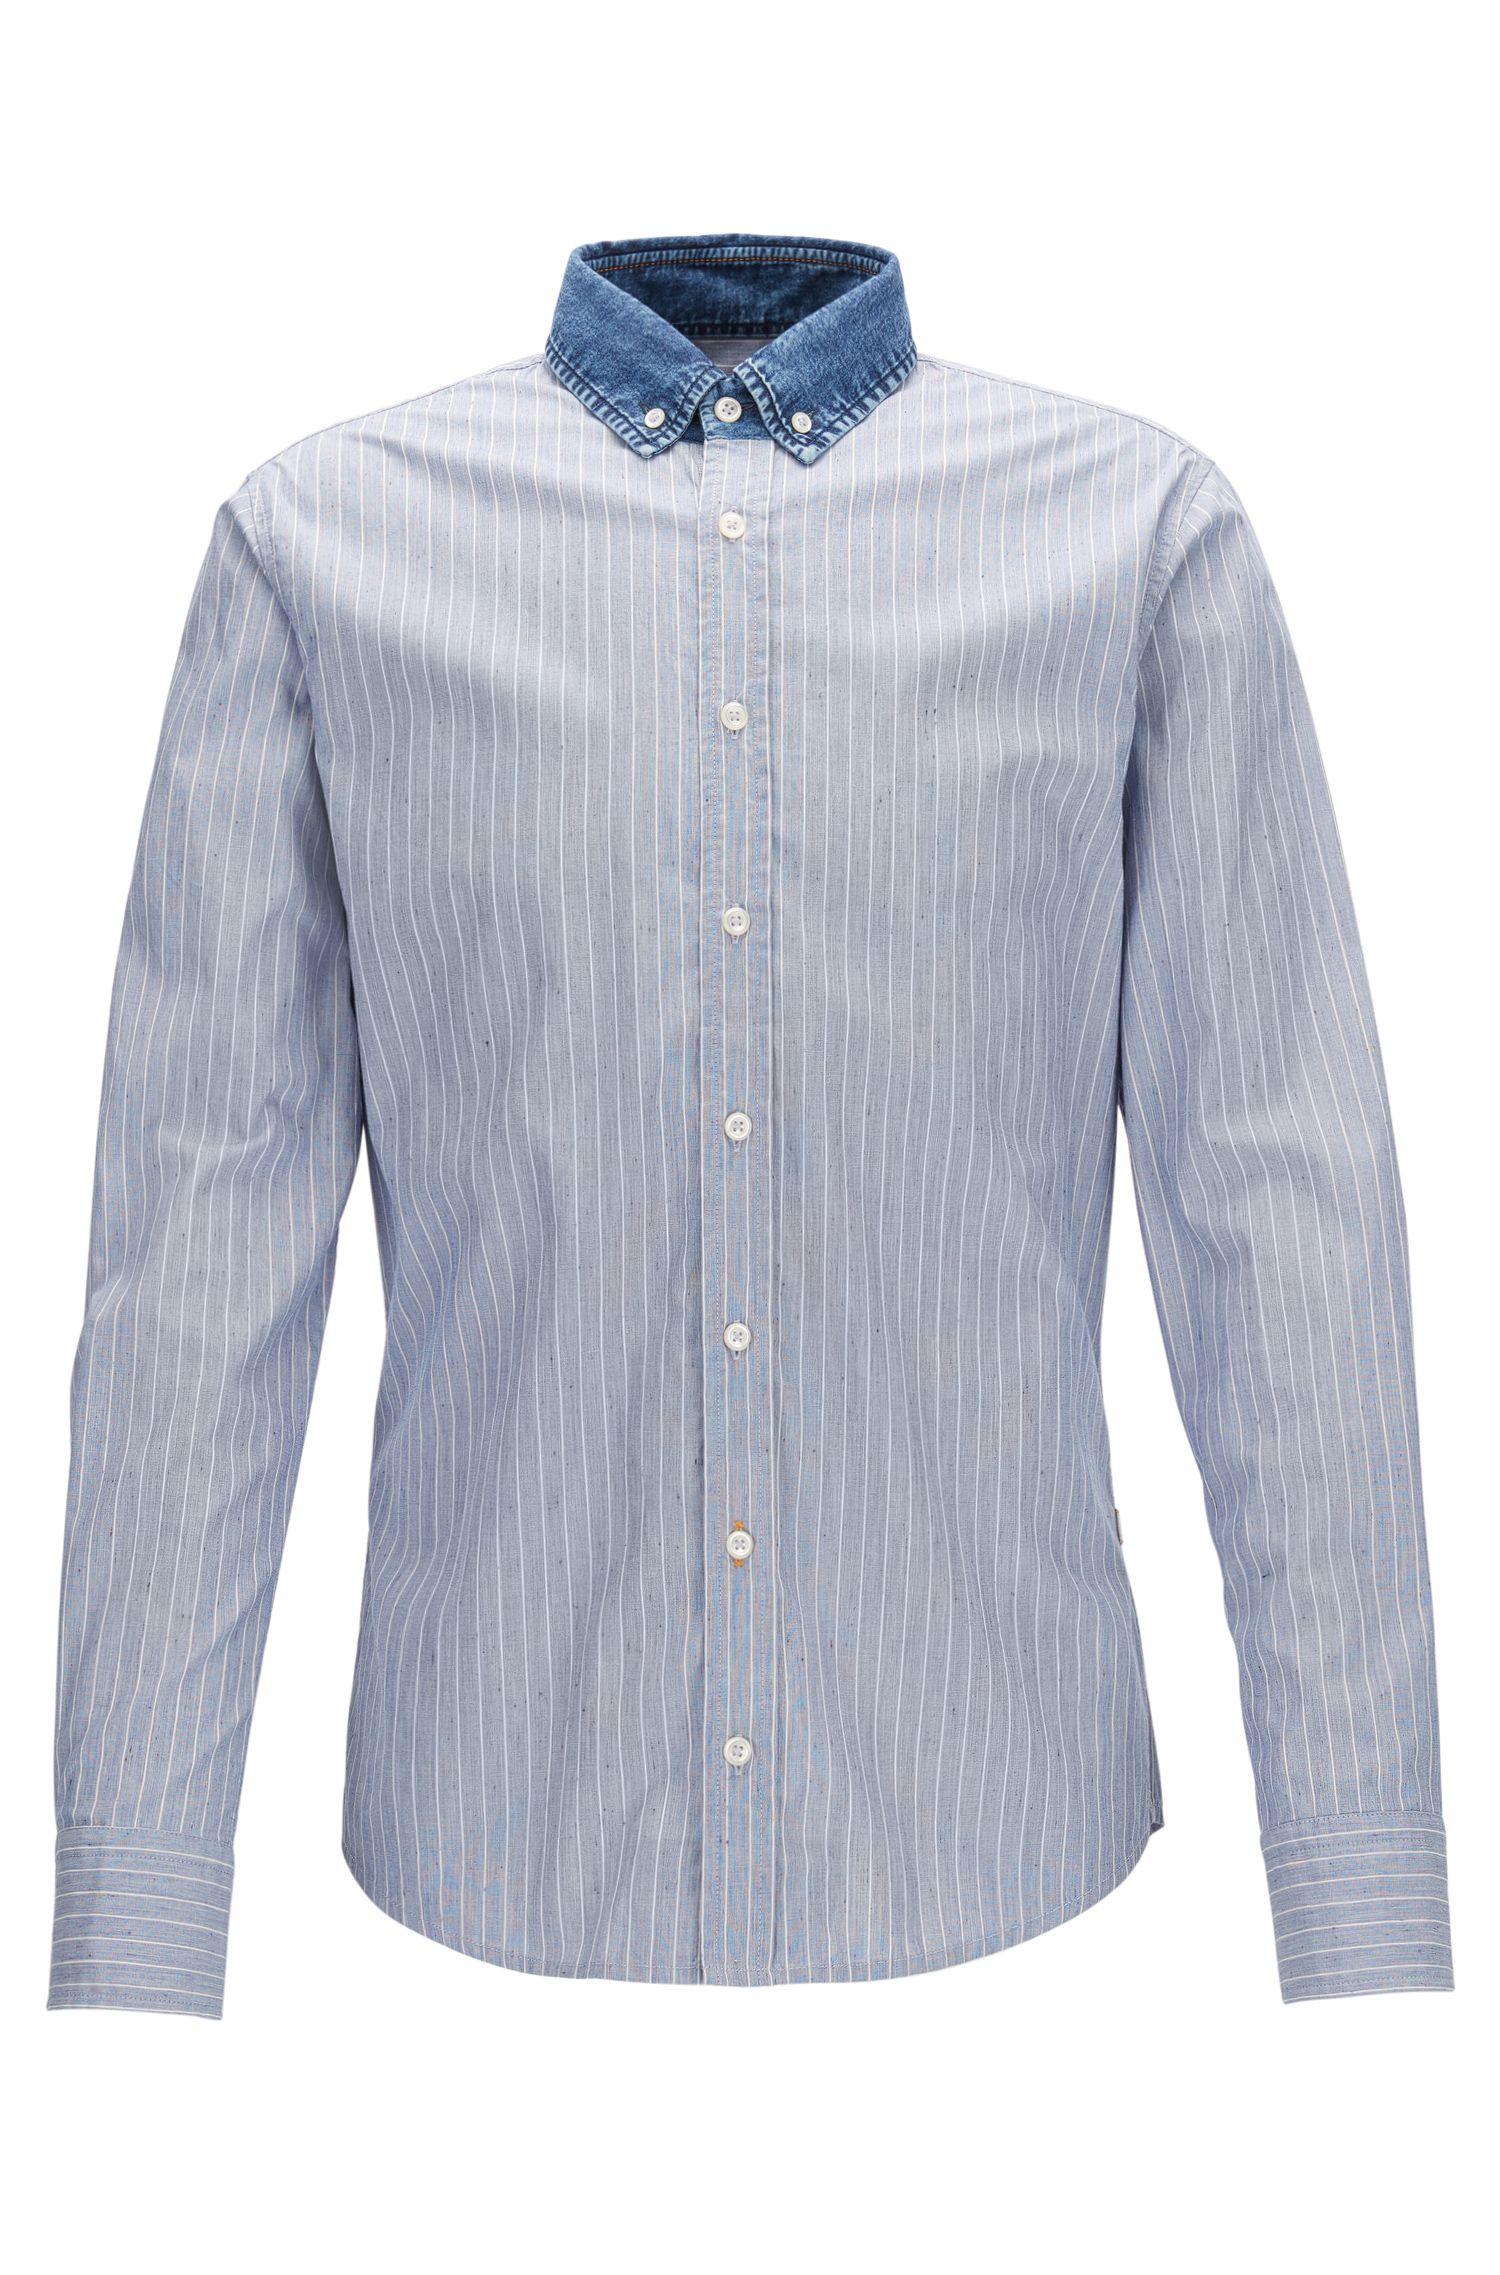 Striped Cotton Sport Shirt, Slim Fit | Epreppy